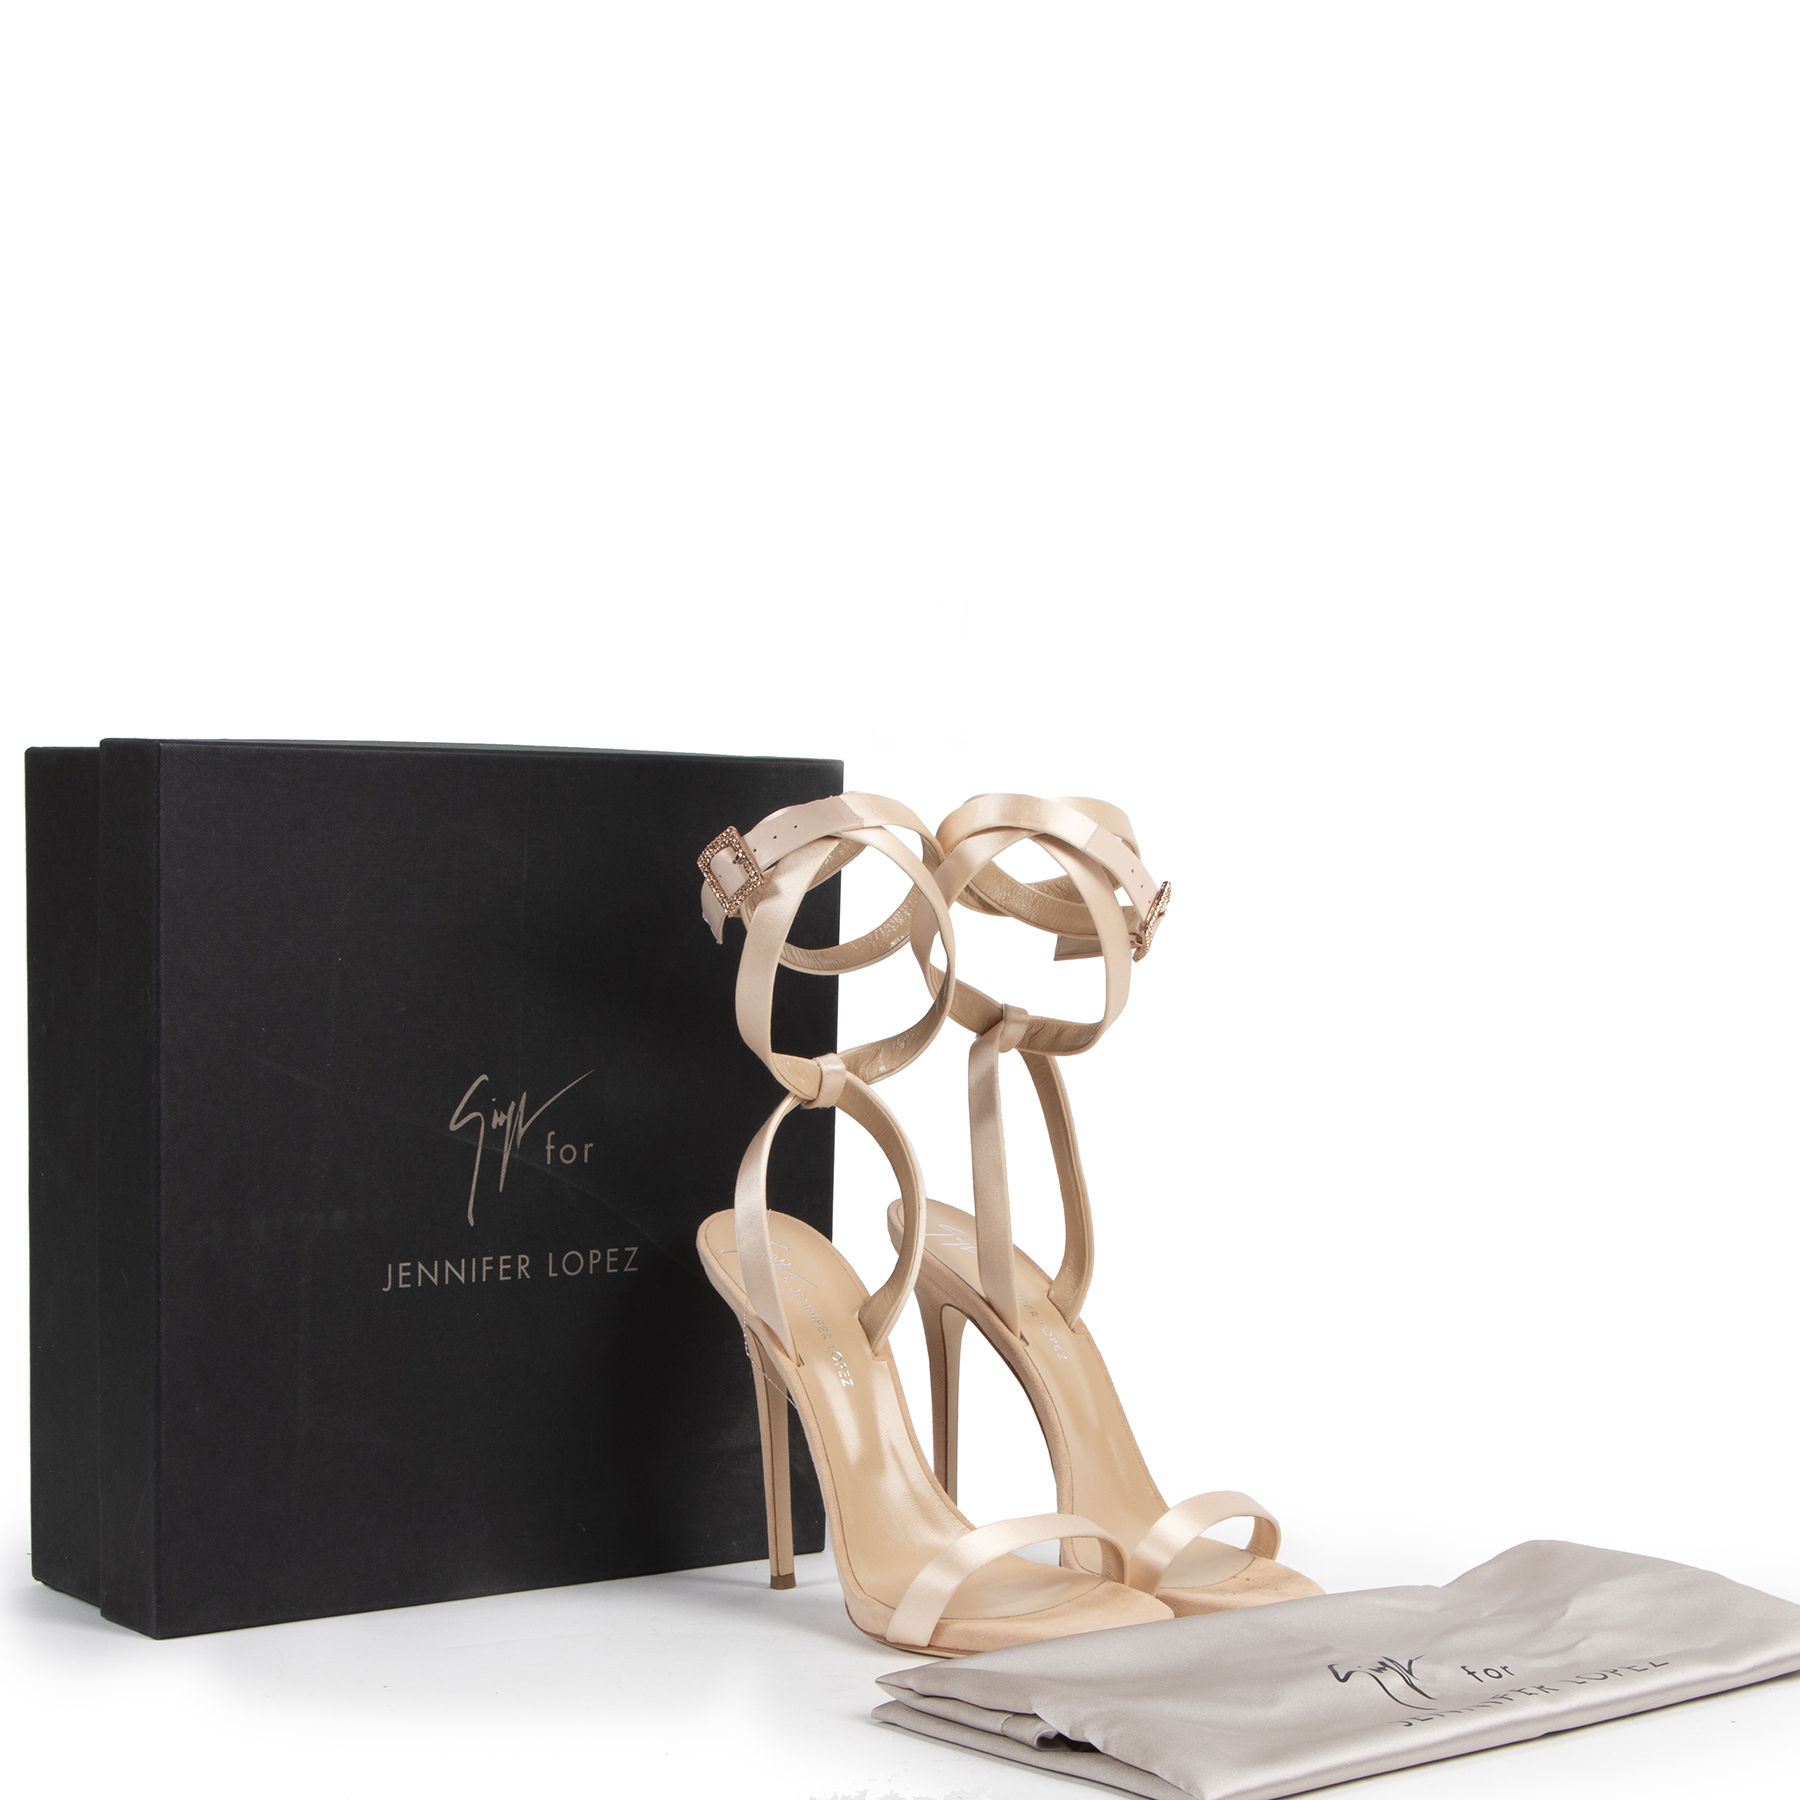 Authentic secondhand Guiseppe Zanotti for Jennifer Lopez Satin Sandals - size 40 designer bags fashion luxury vintage webshop shopping